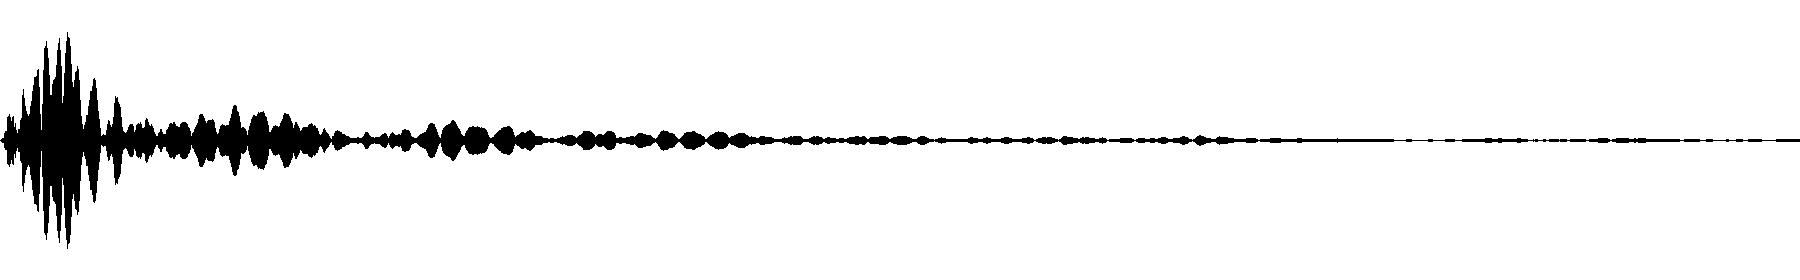 cn008c eq conga